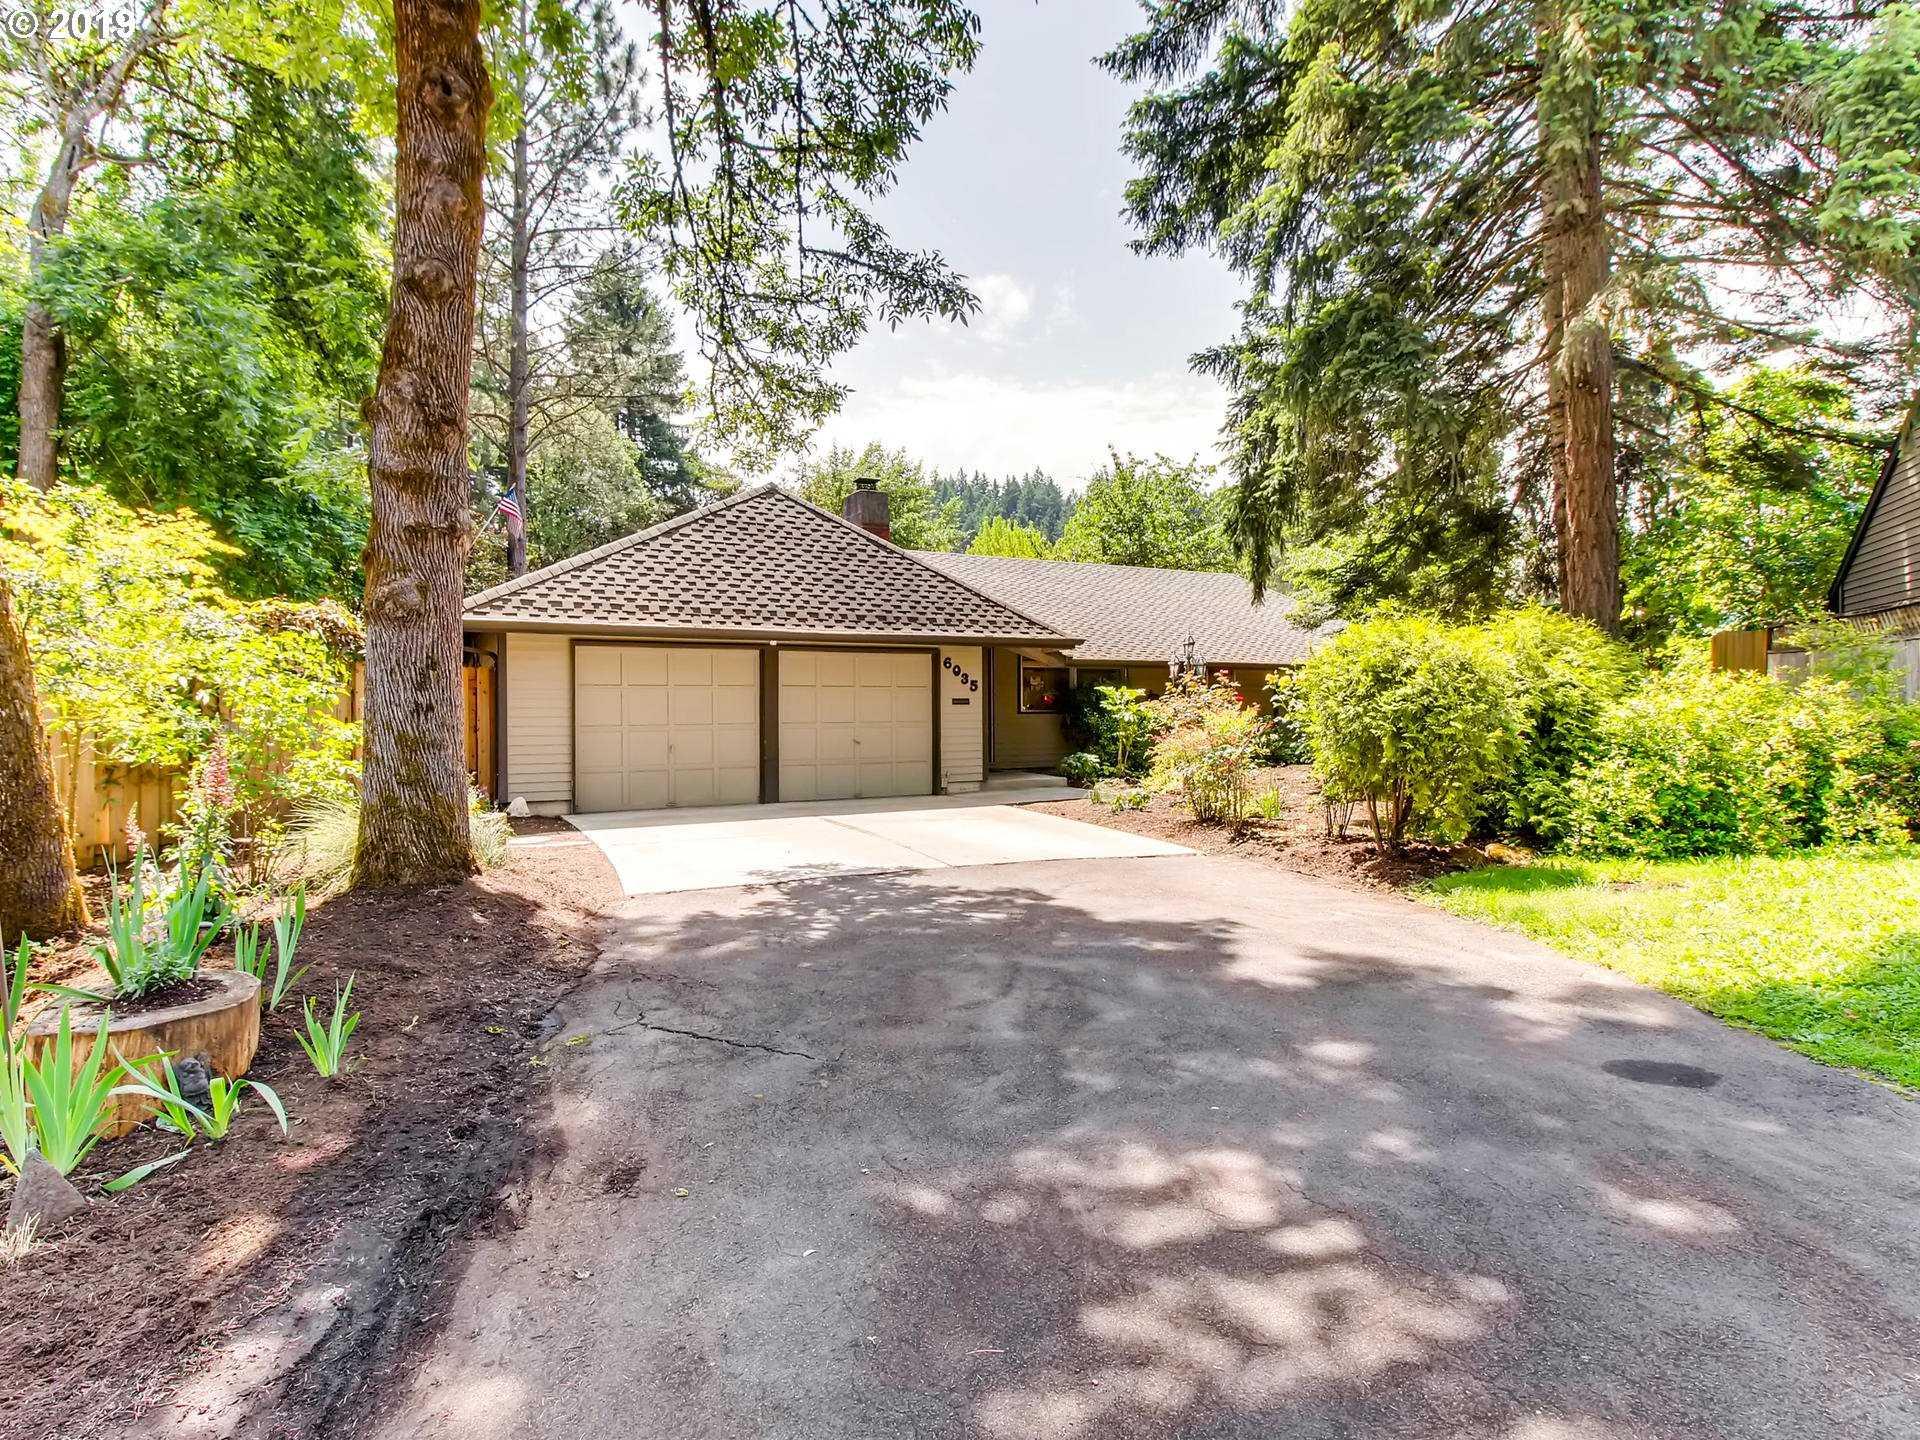 $384,900 - 4Br/2Ba -  for Sale in Four Seasons, Beaverton